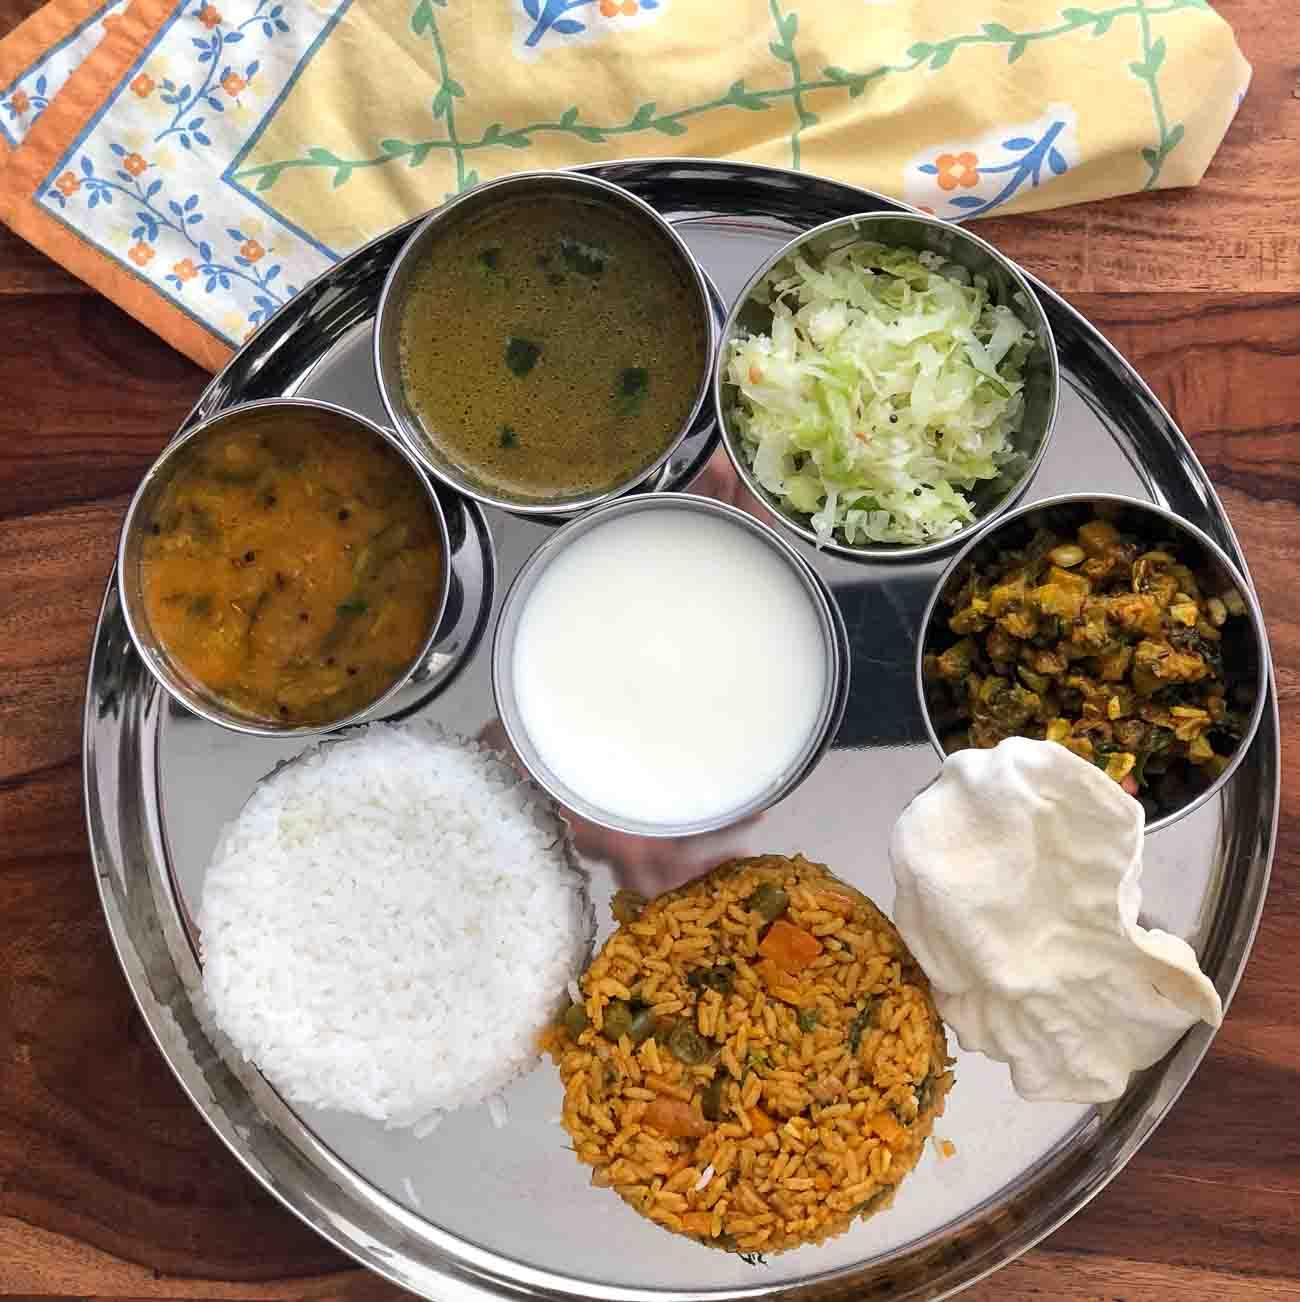 Everyday Meal Plate : Murungakkai Vendhaya Keerai Sambar, Jeera Milagu Rasam, Cabbage Poriyal, Pavakka Poriyal And Tomato Rice